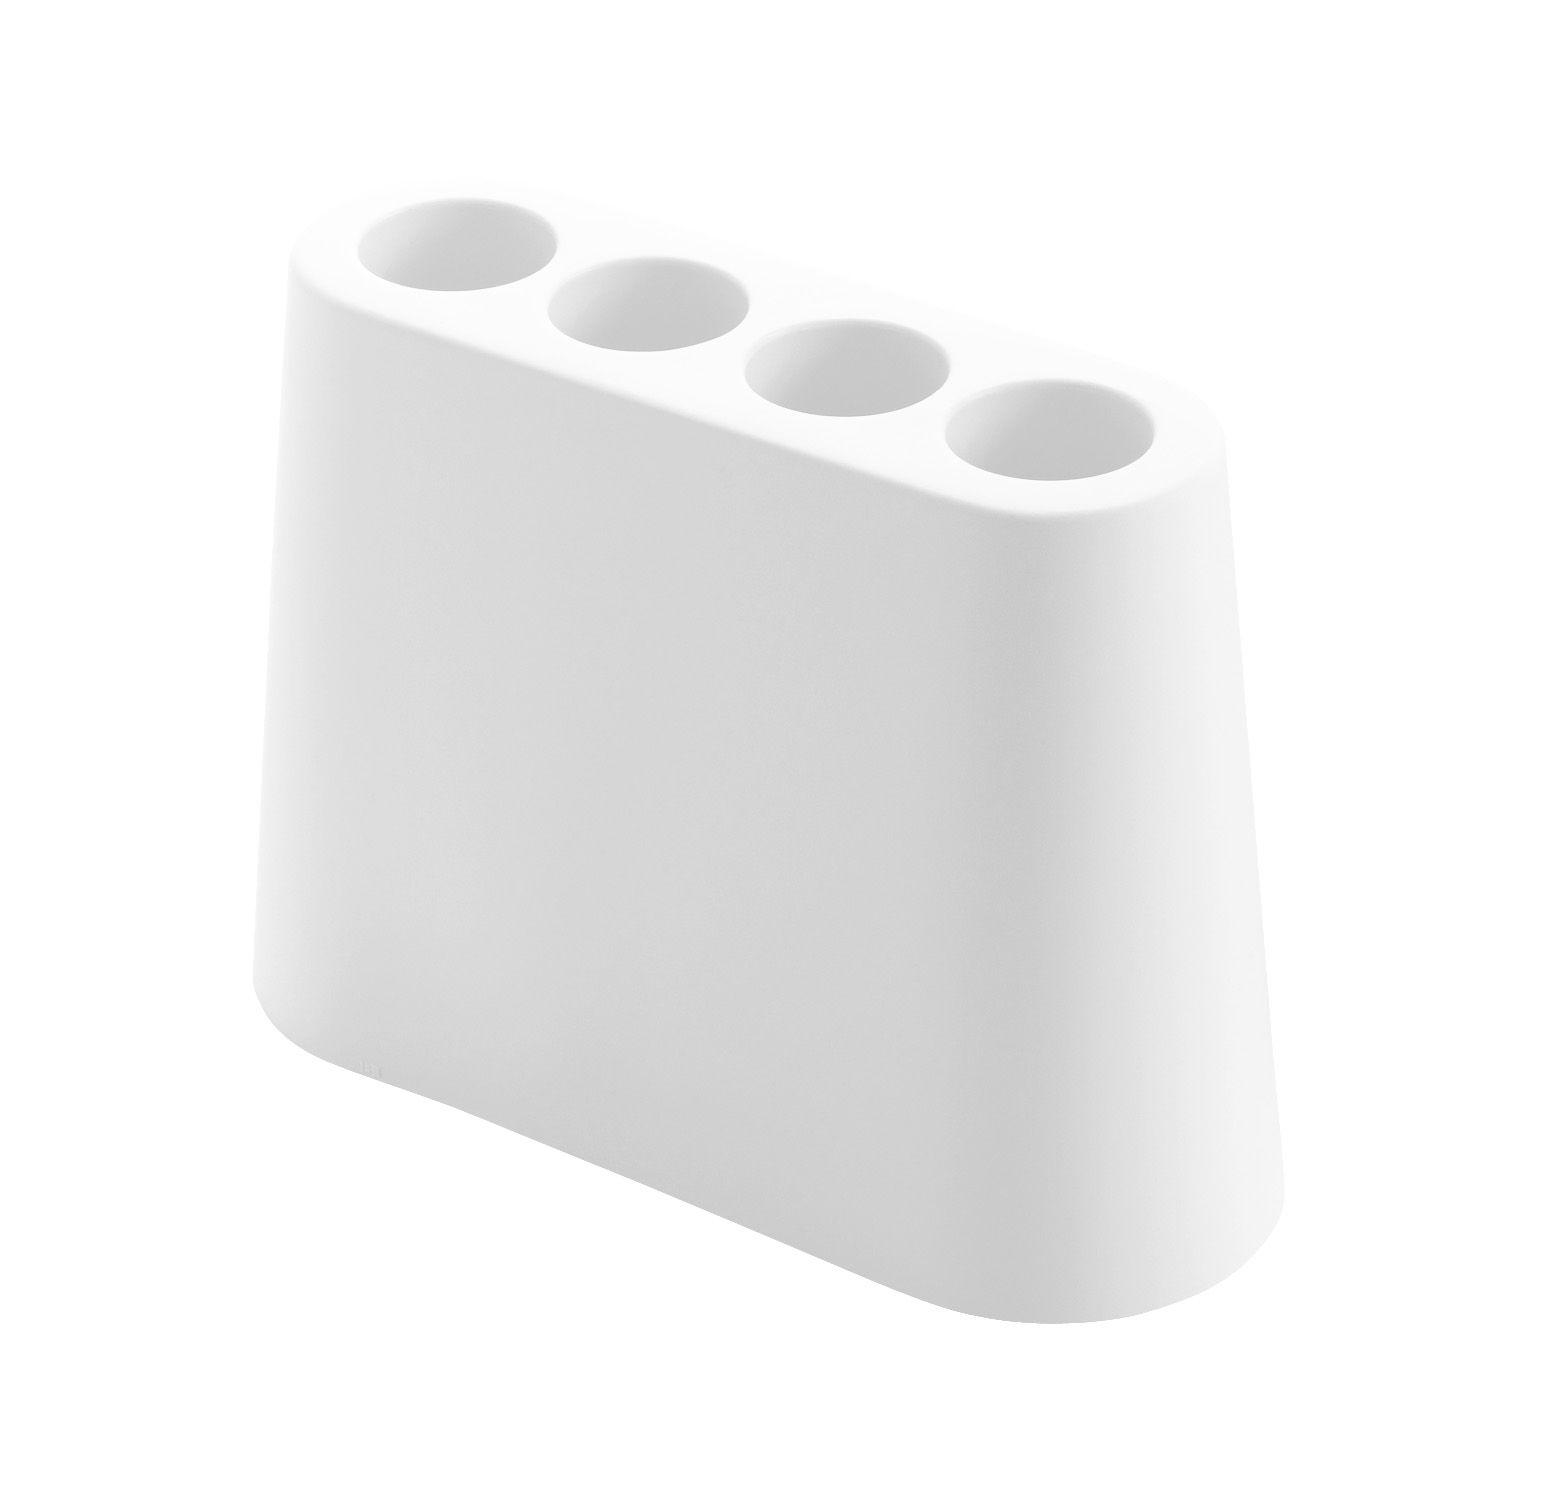 Decoration - Boxes & Baskets - Aki Umbrella holder by B-LINE - White - Polythene